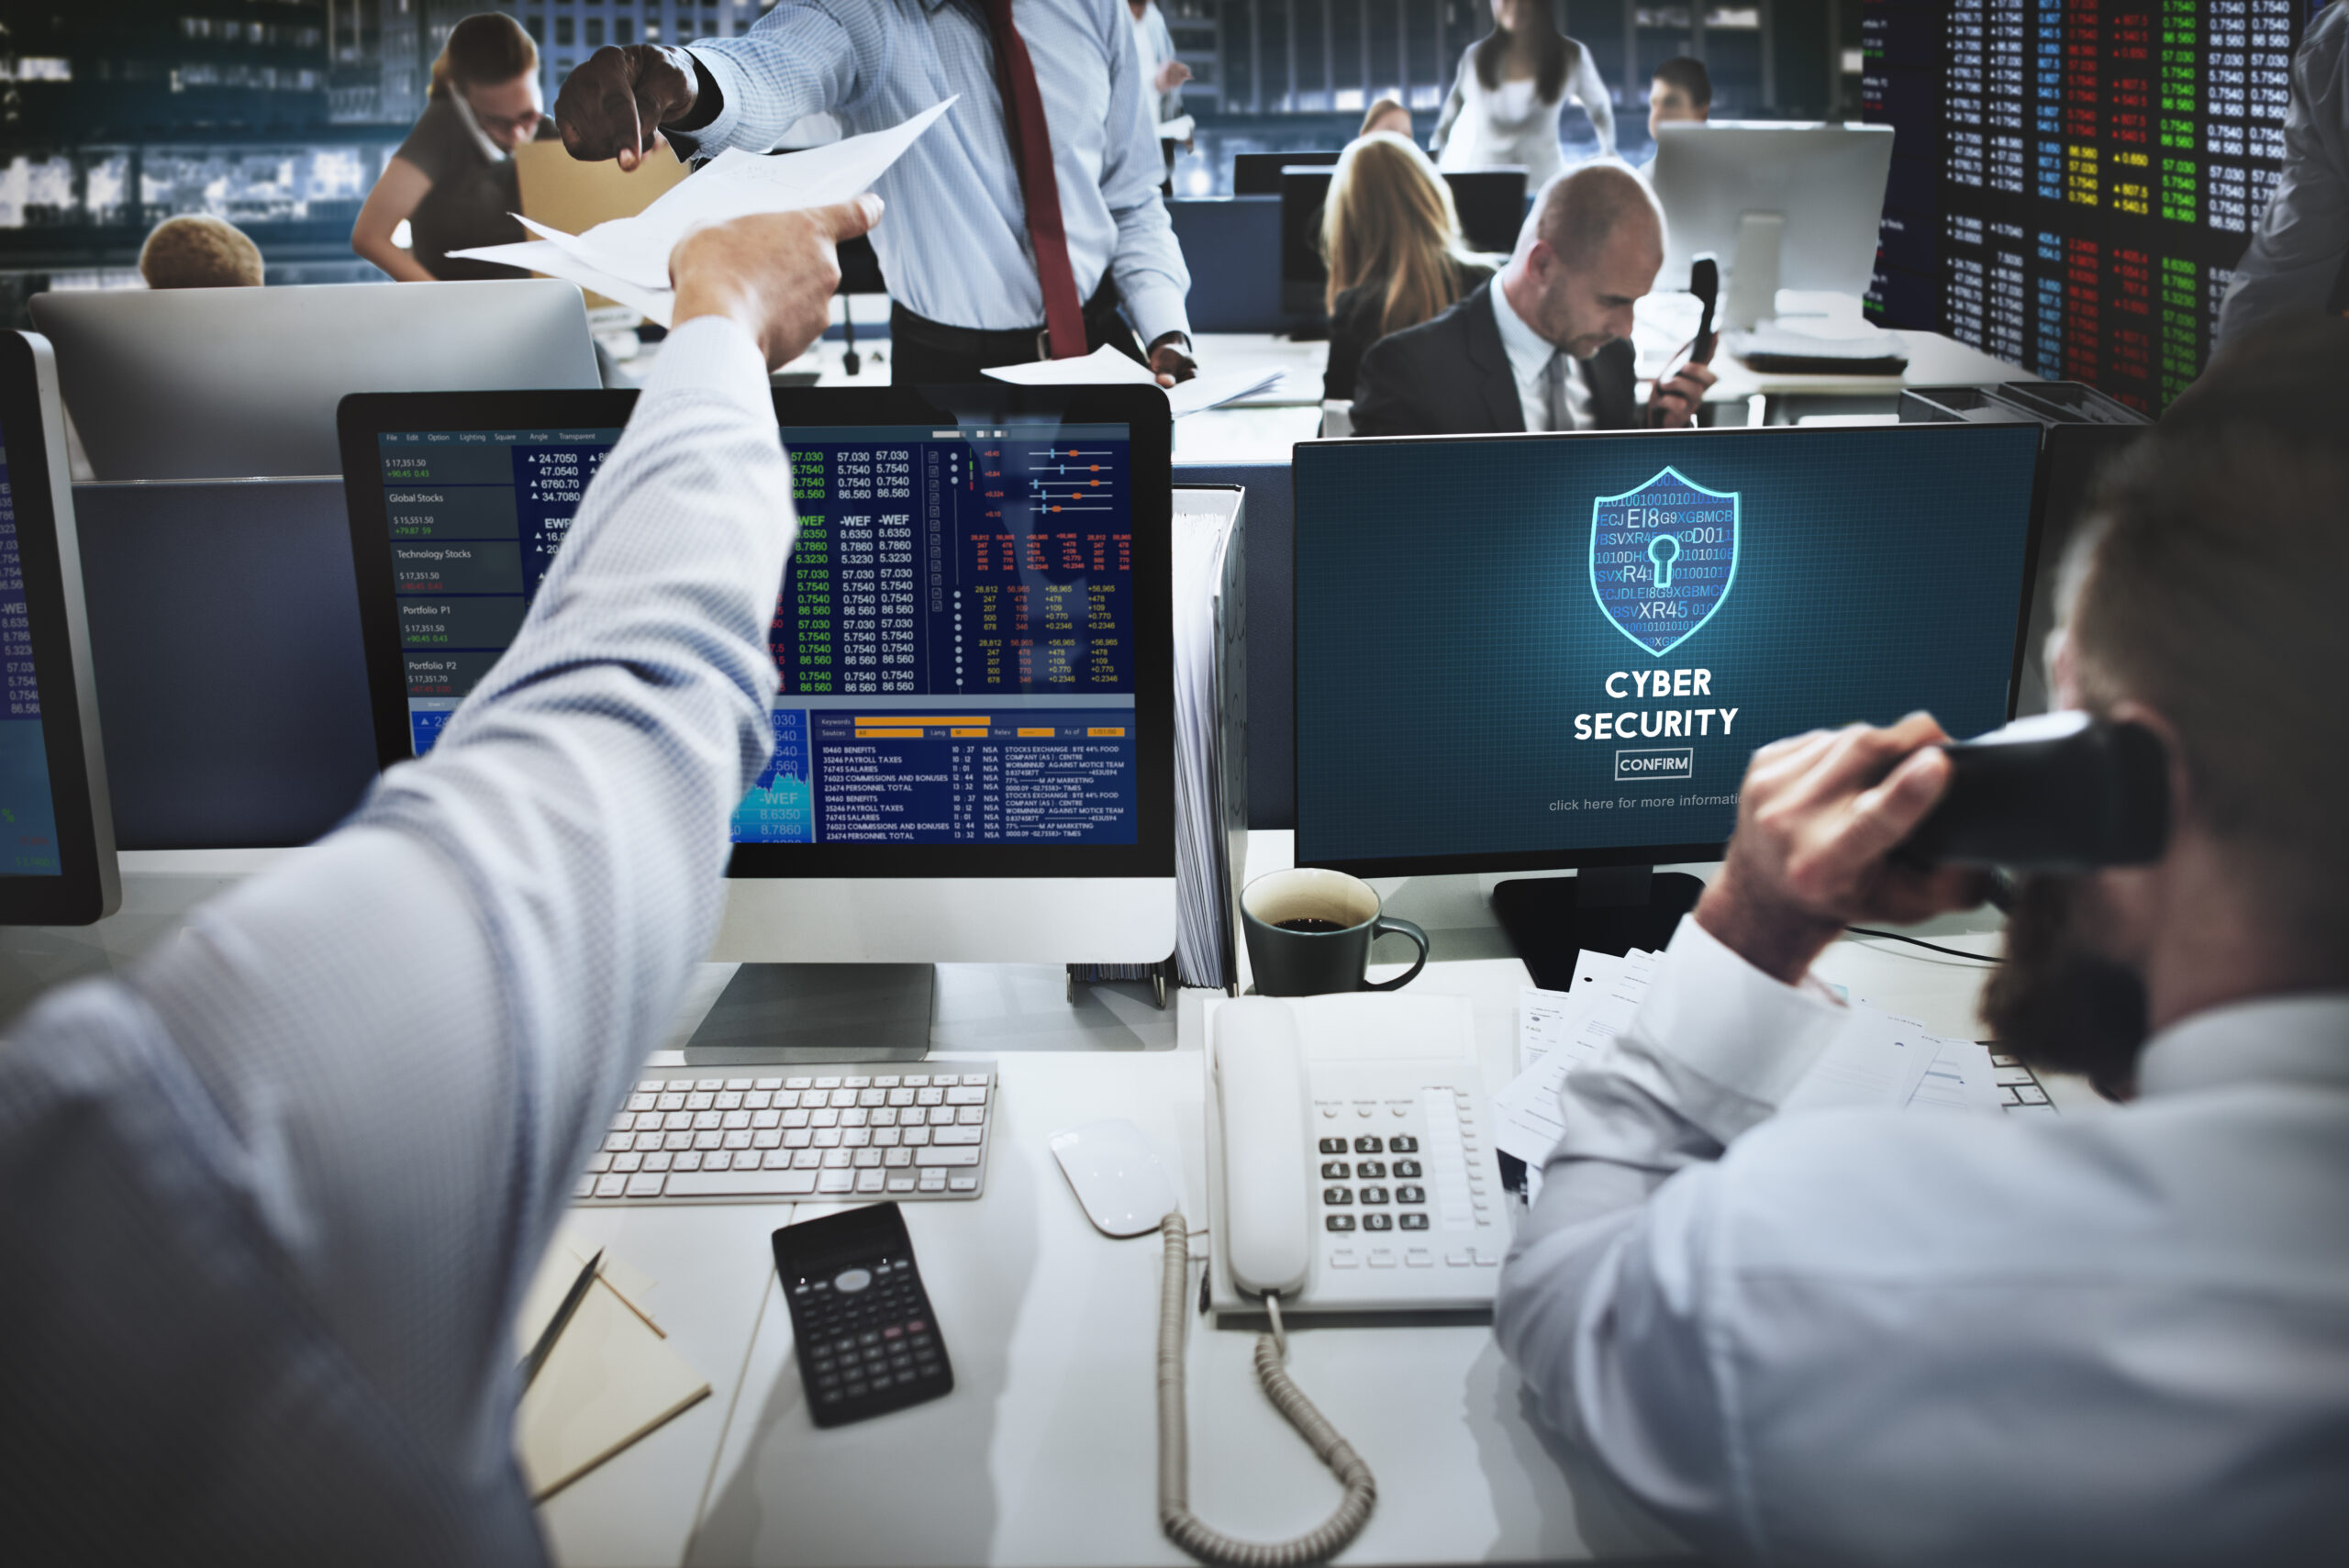 accademia italiana cyber security